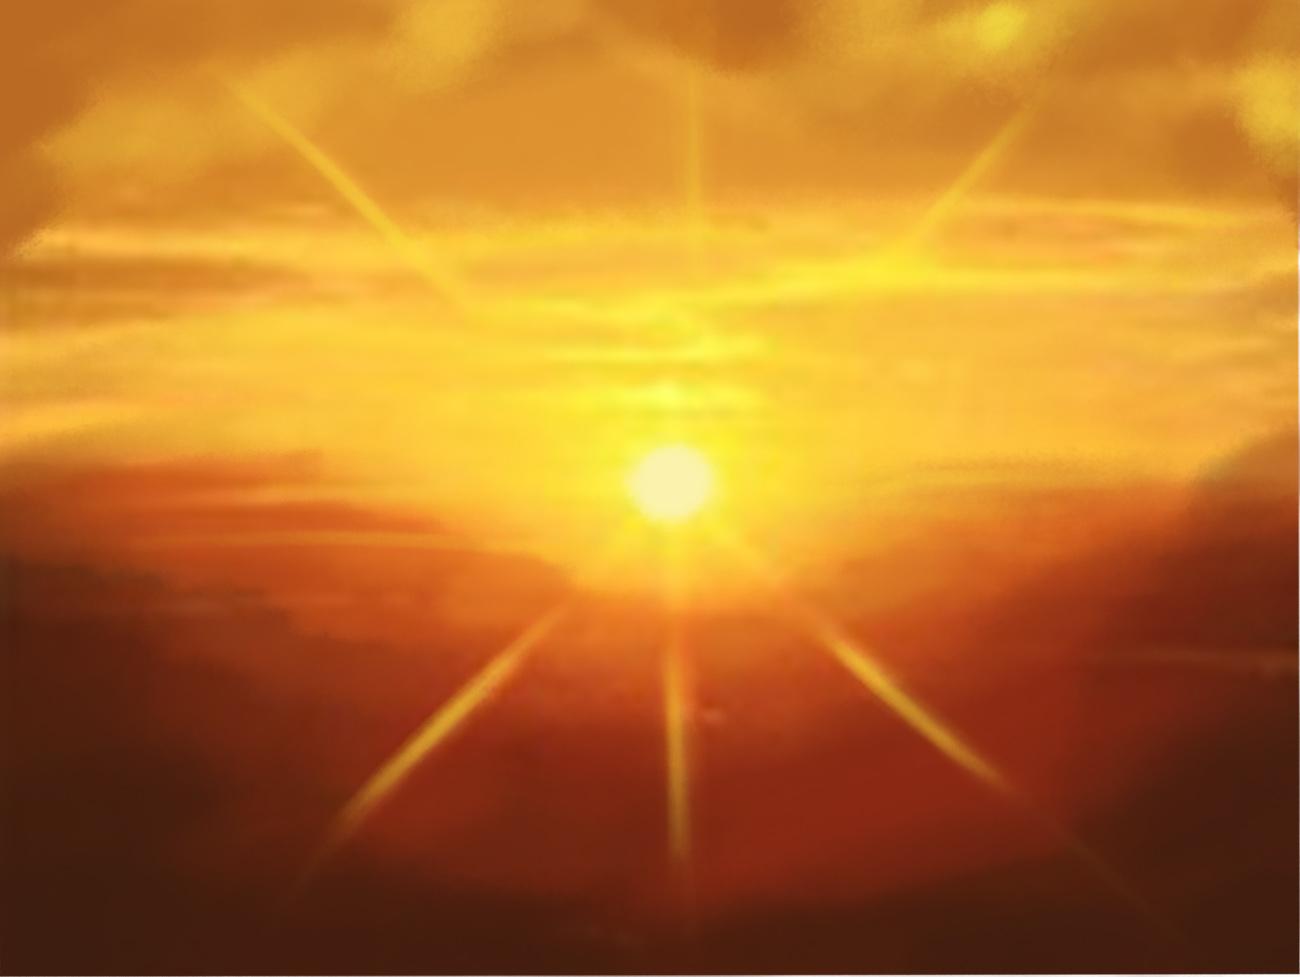 effect of sunlight